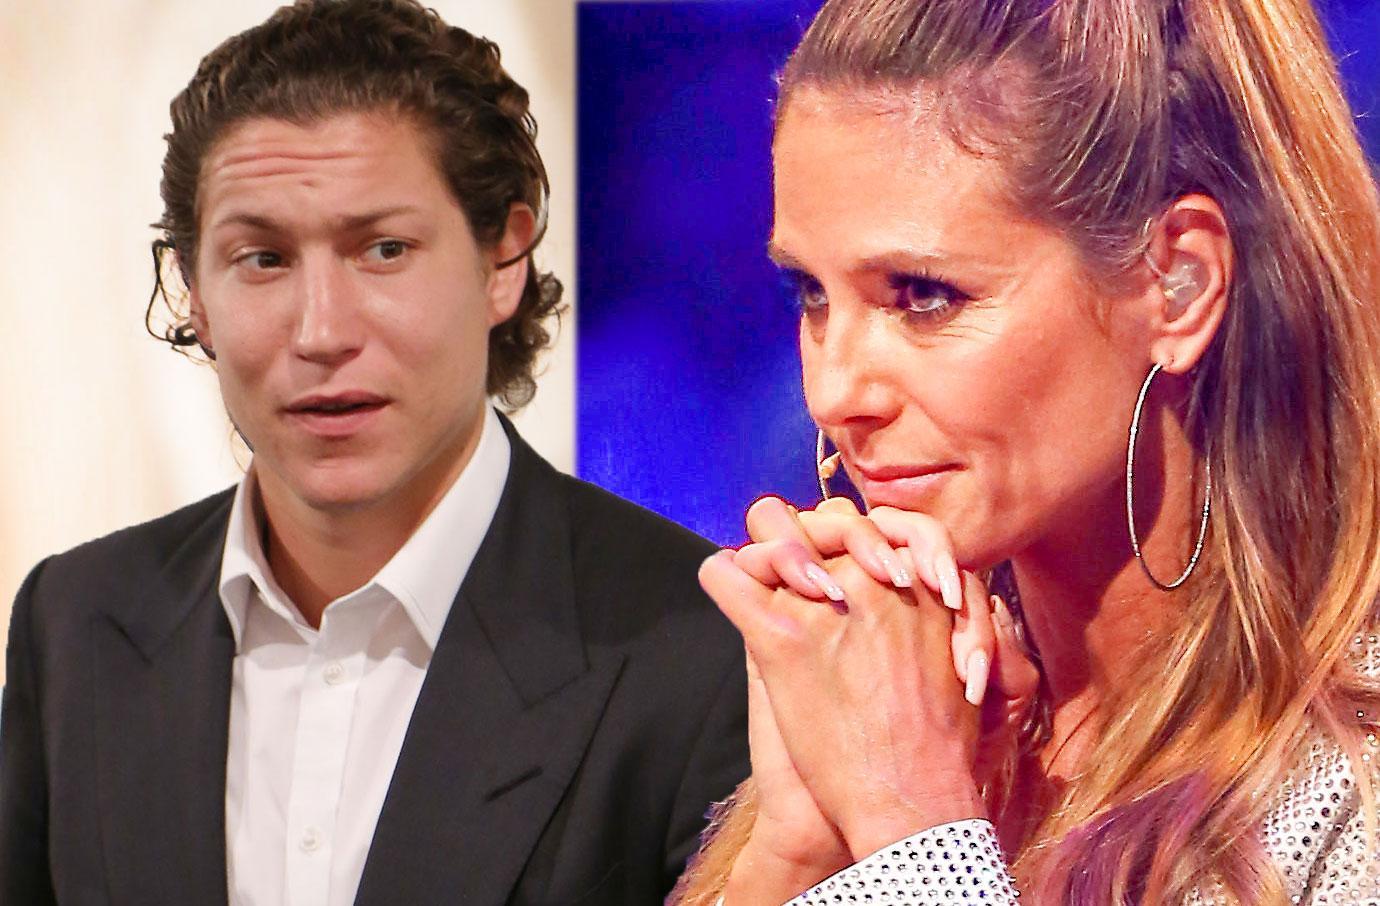 Heidi Klum In Denial Boyfriend Vito Schnabel Claims He Didn't Cheat